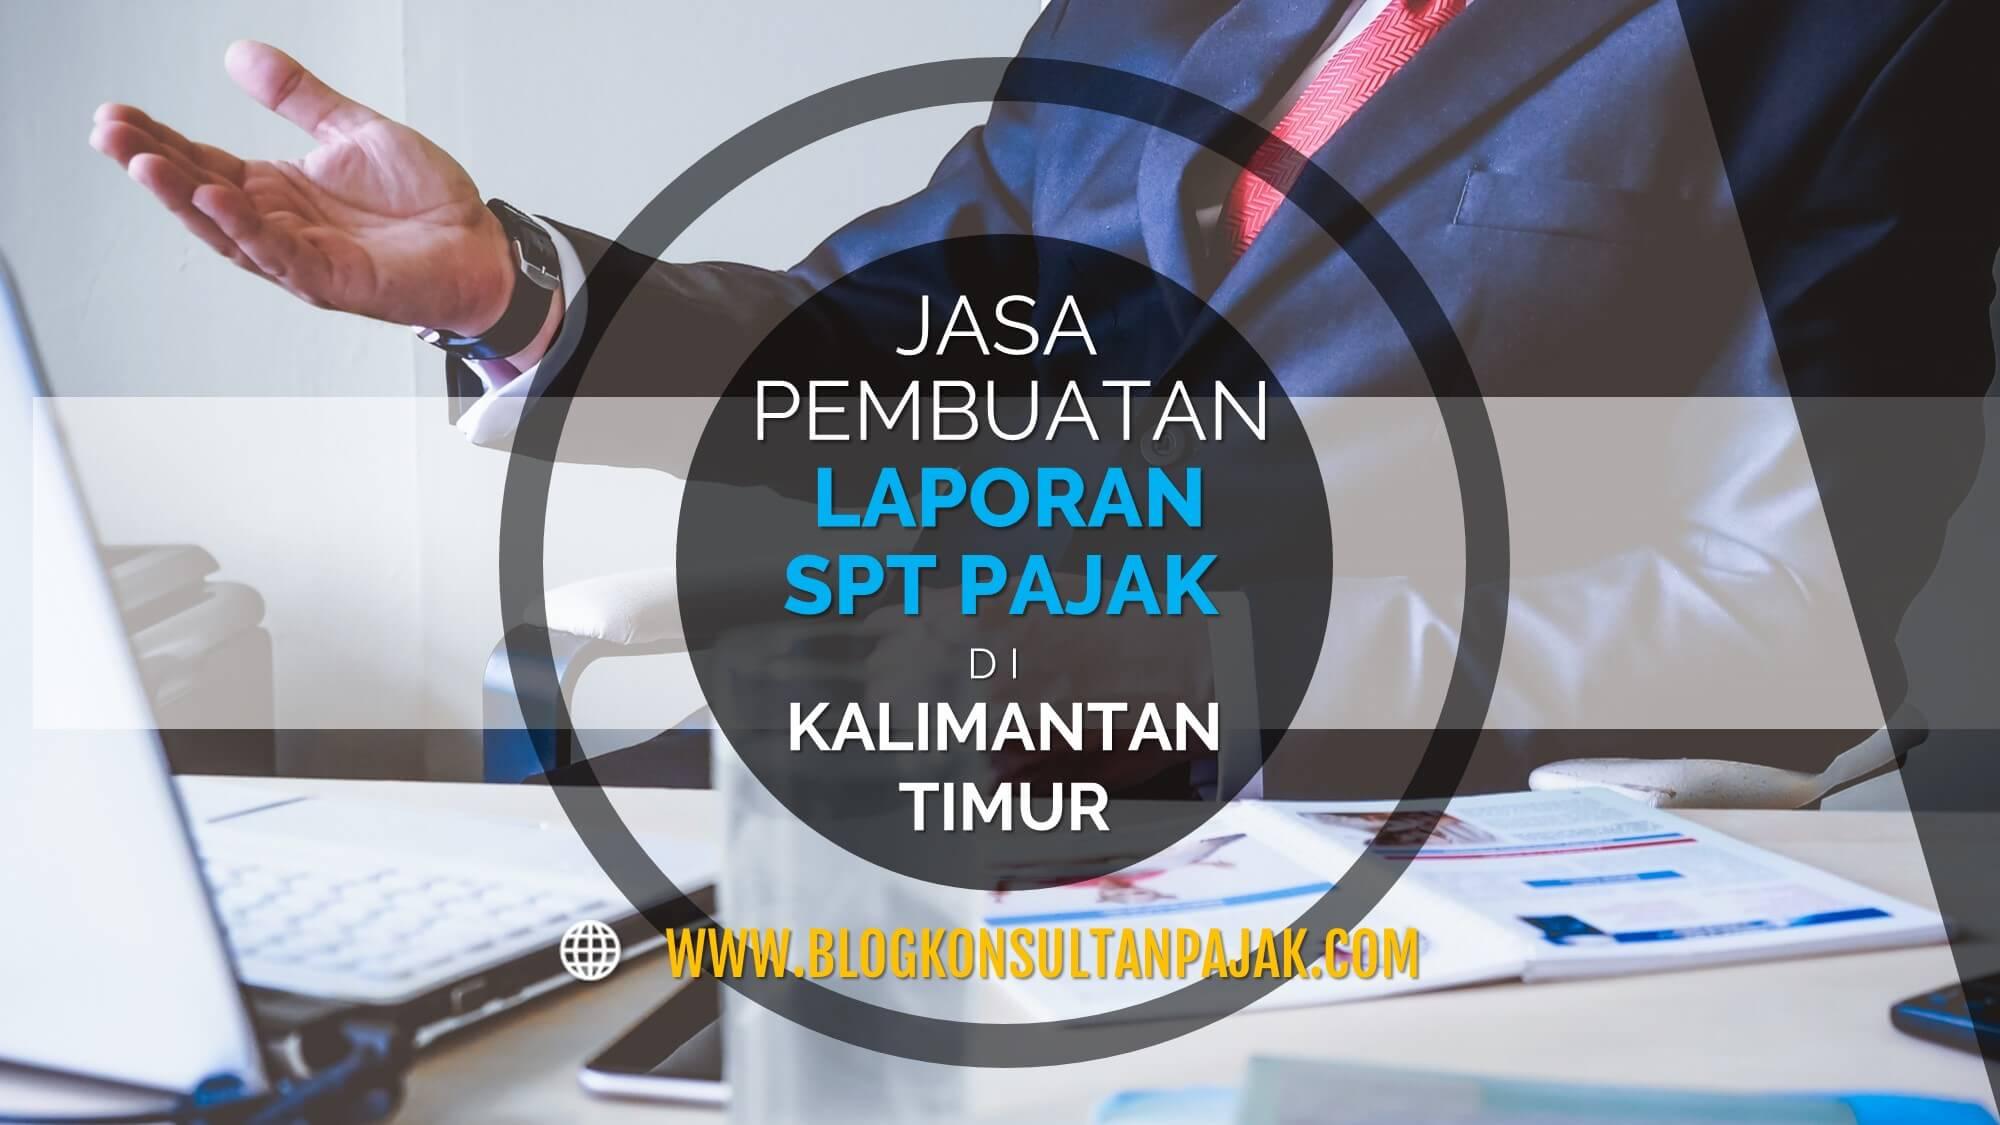 Jasa Pembuatan Laporan Pajak Bulanan Perusahaan Di Simpang Pasir Palaran Samarinda Kalimantan Timur